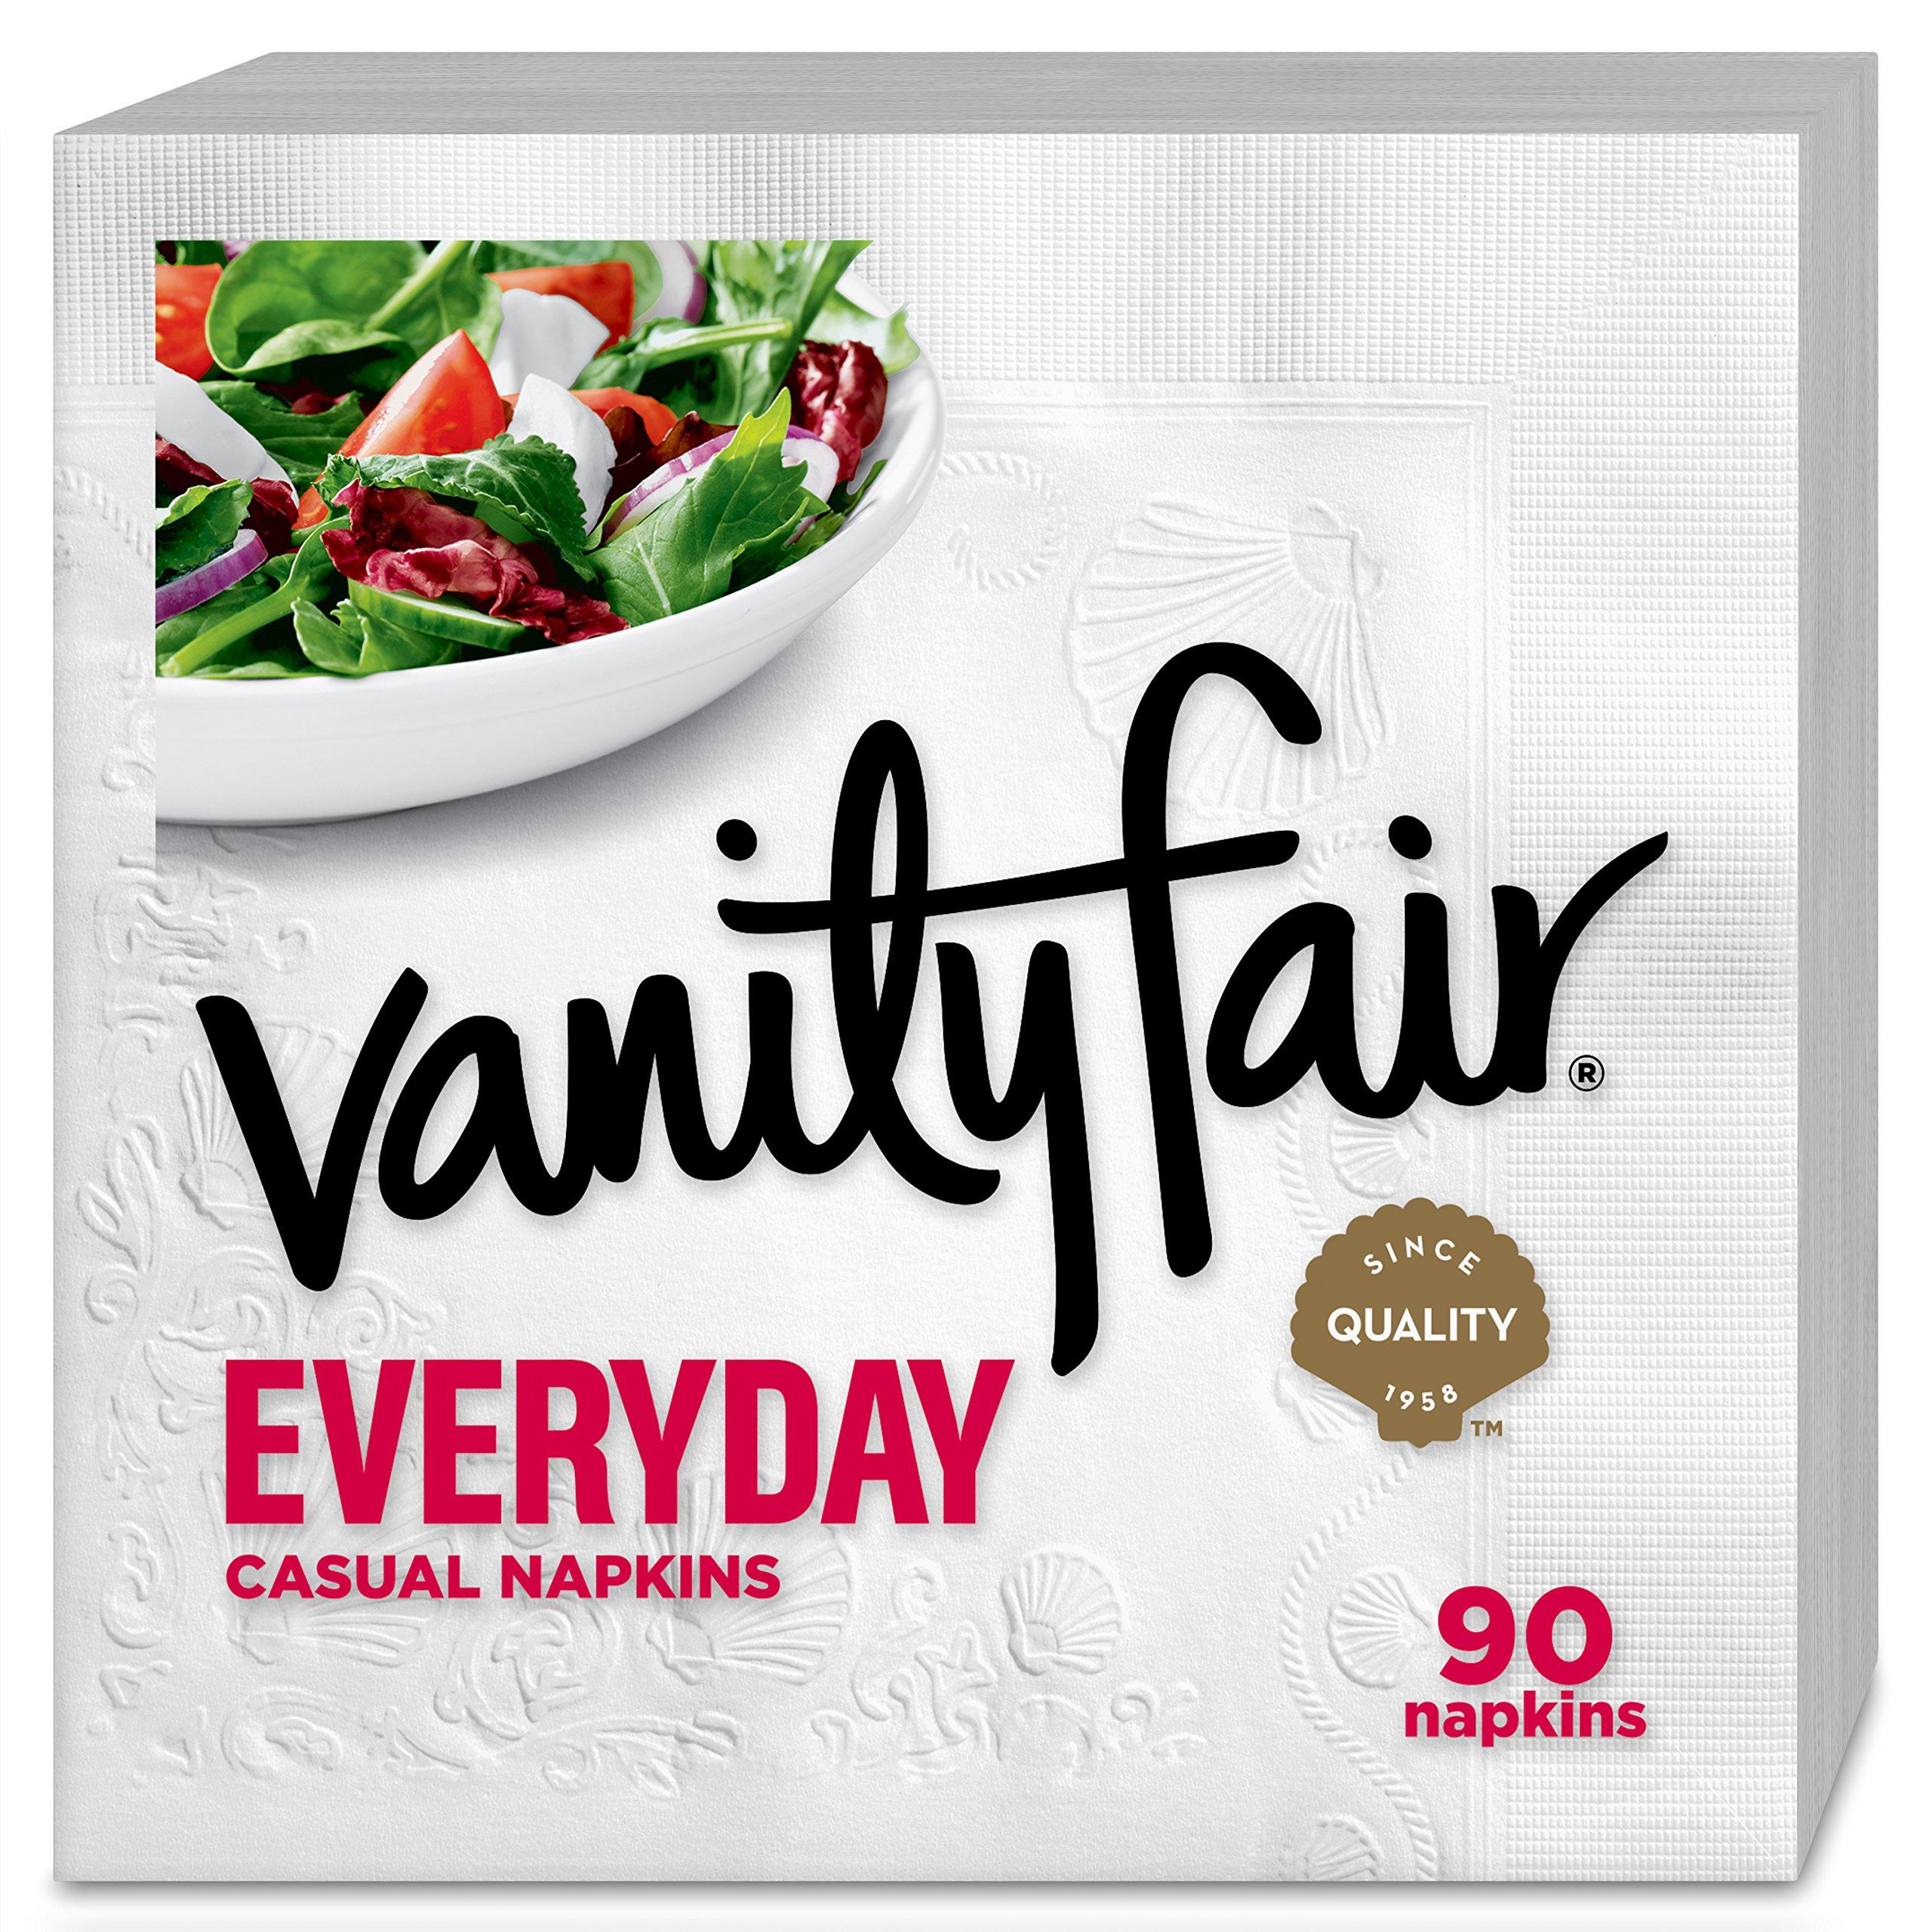 Vanity Fair Everyday Napkins, 1080 Count, White Paper Napkins, 12 Packs of 90 Napkins by Vanity Fair (Image #3)